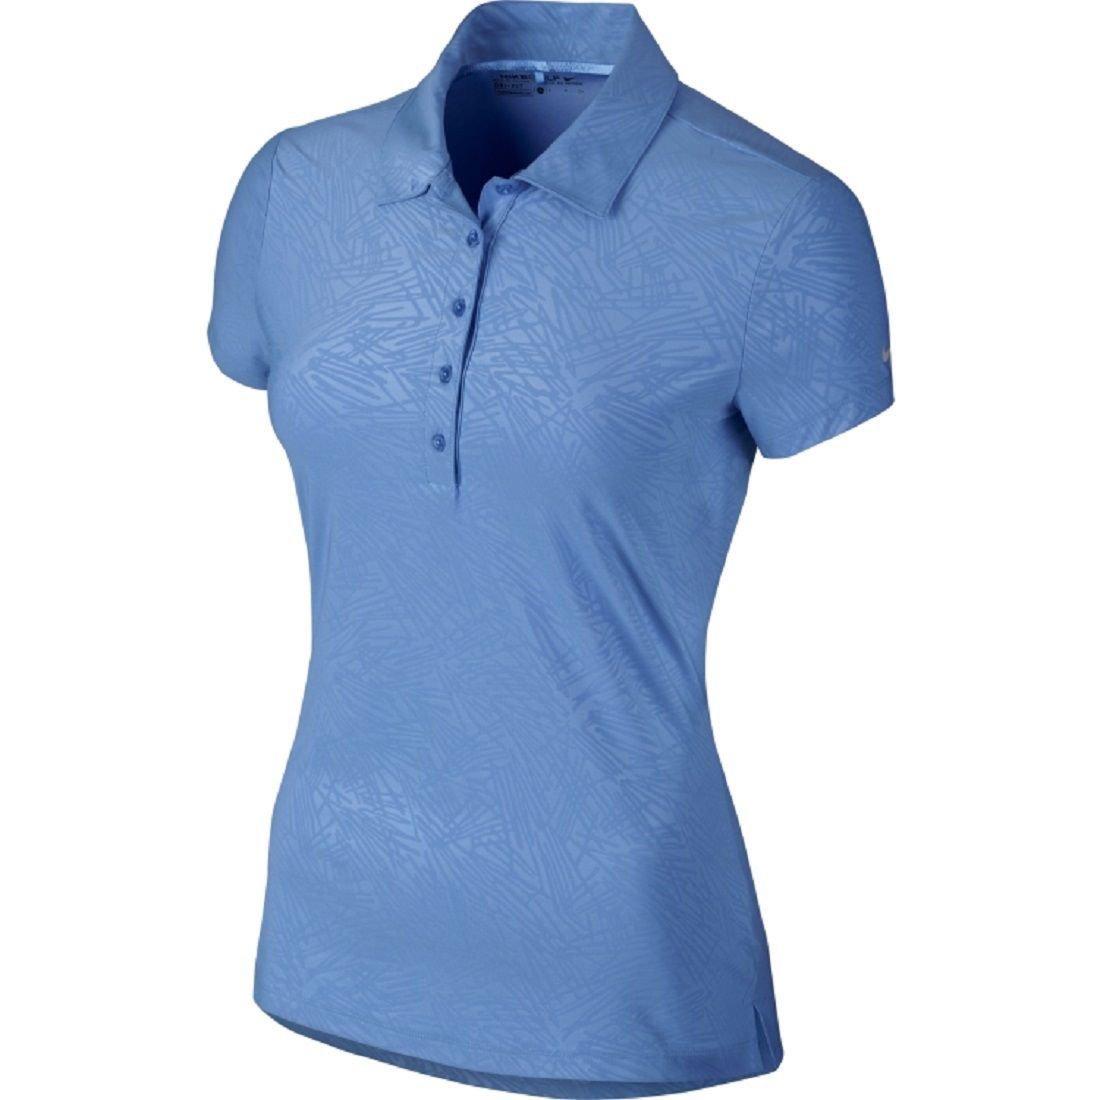 00119446 Top1: Nike Golf Women's Dri Fit Precision Emboss Polo Shirt Blue Size  Medium. Wholesale Price: